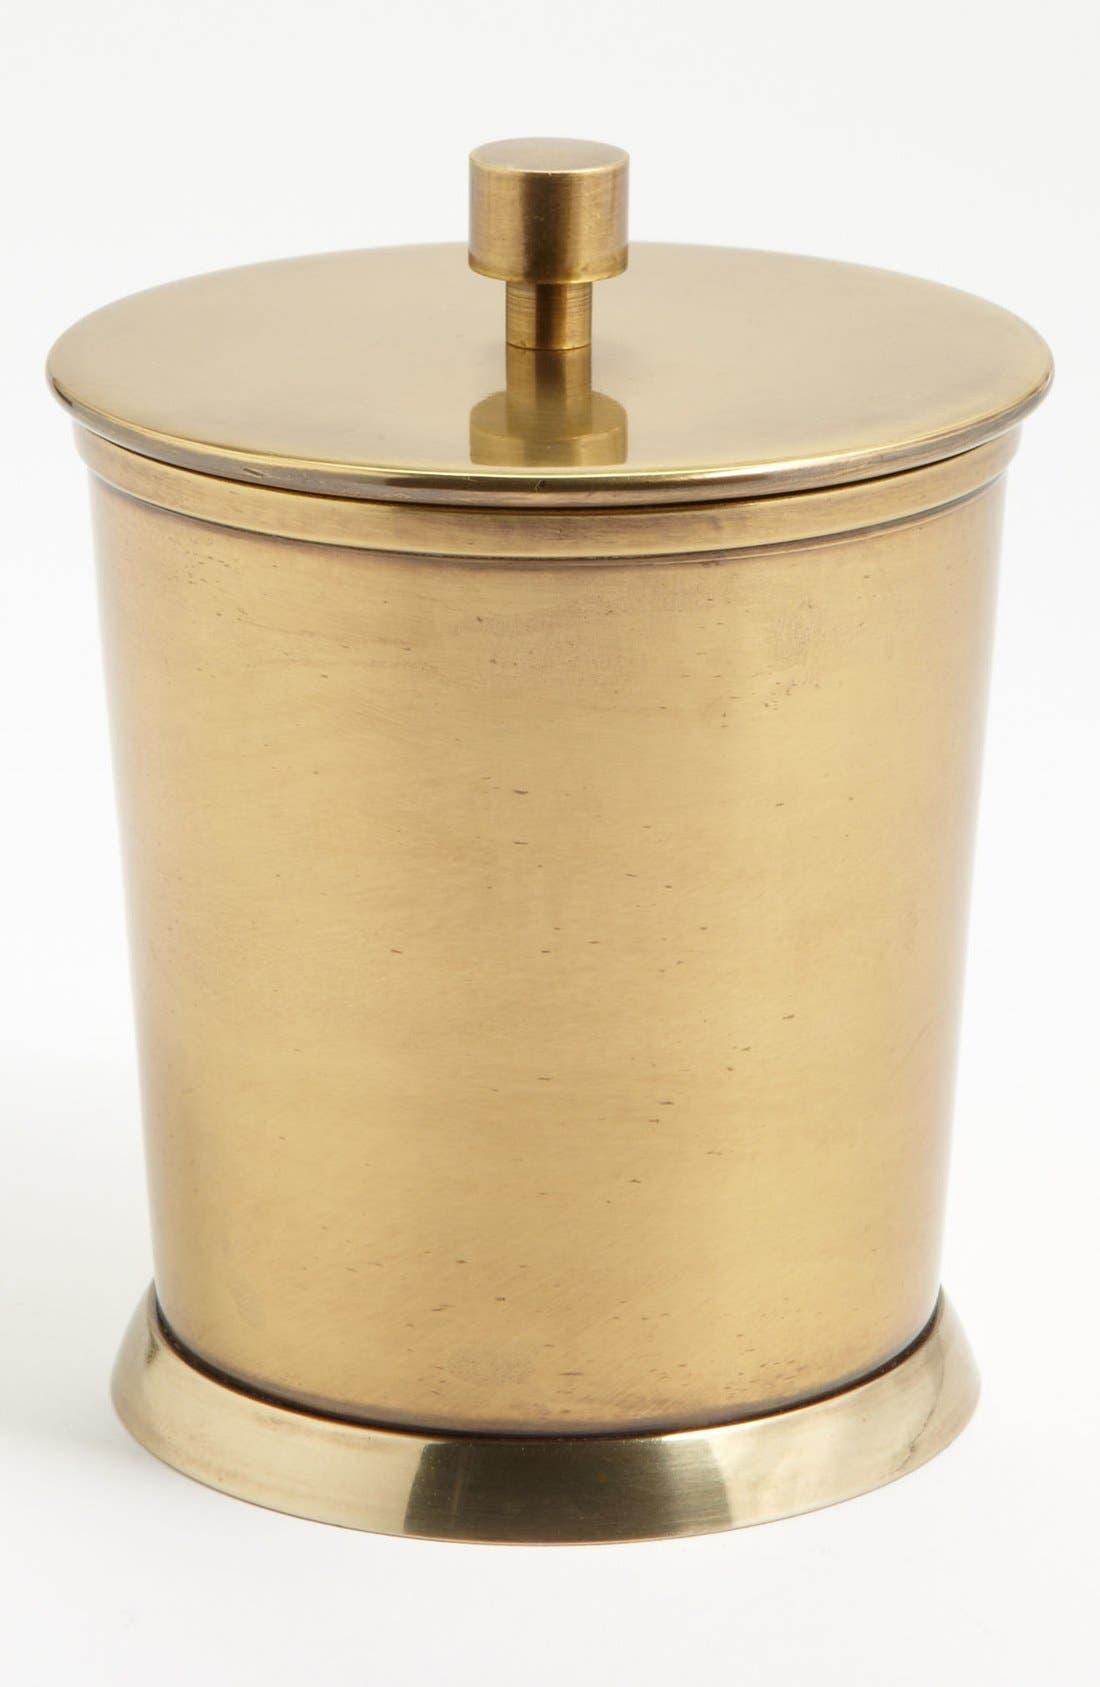 Alternate Image 1 Selected - Waterworks Studio 'Wallingford' Covered Jar (Online Only)